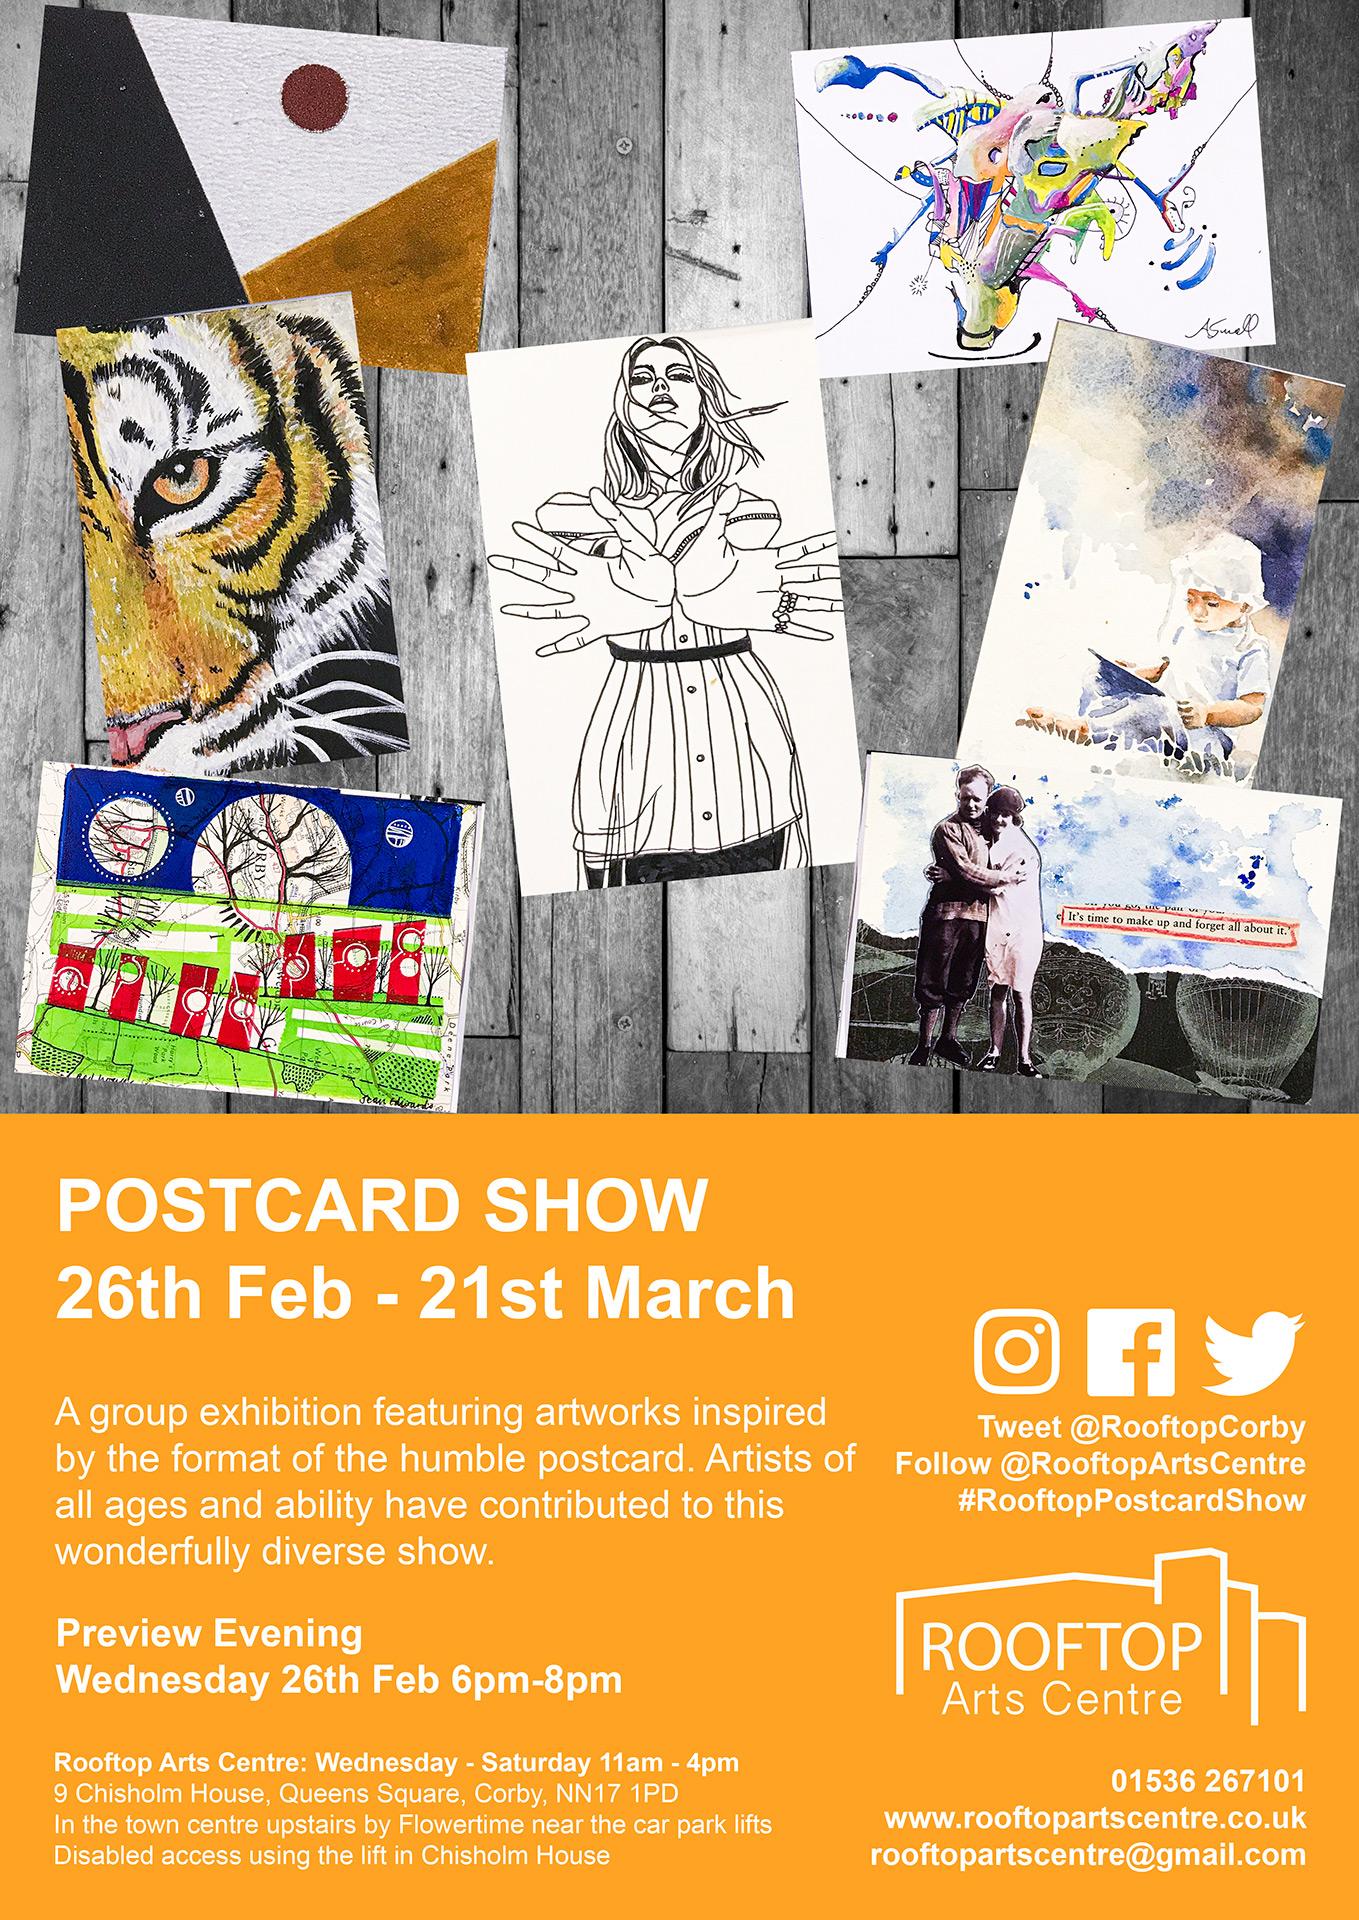 Postcard Show Exhibition Poster